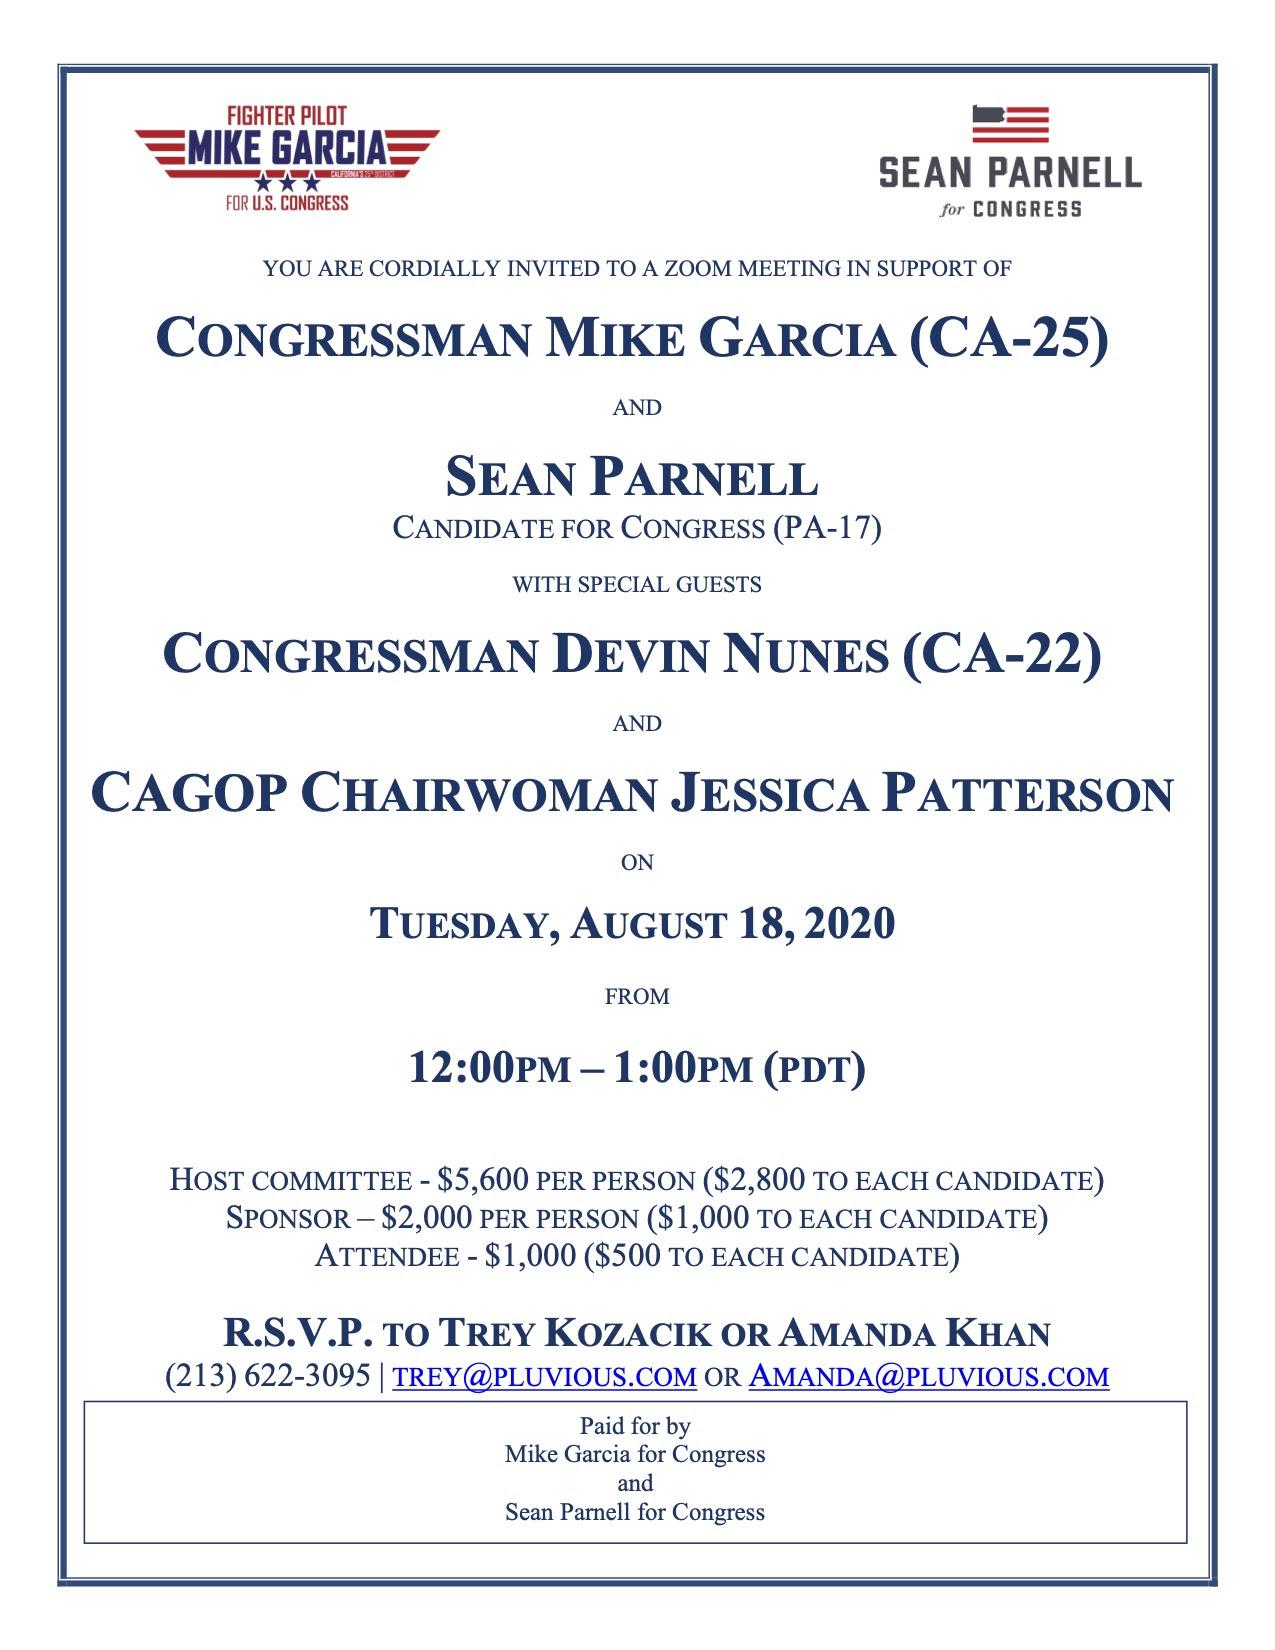 Garcia Fundraiser Invite